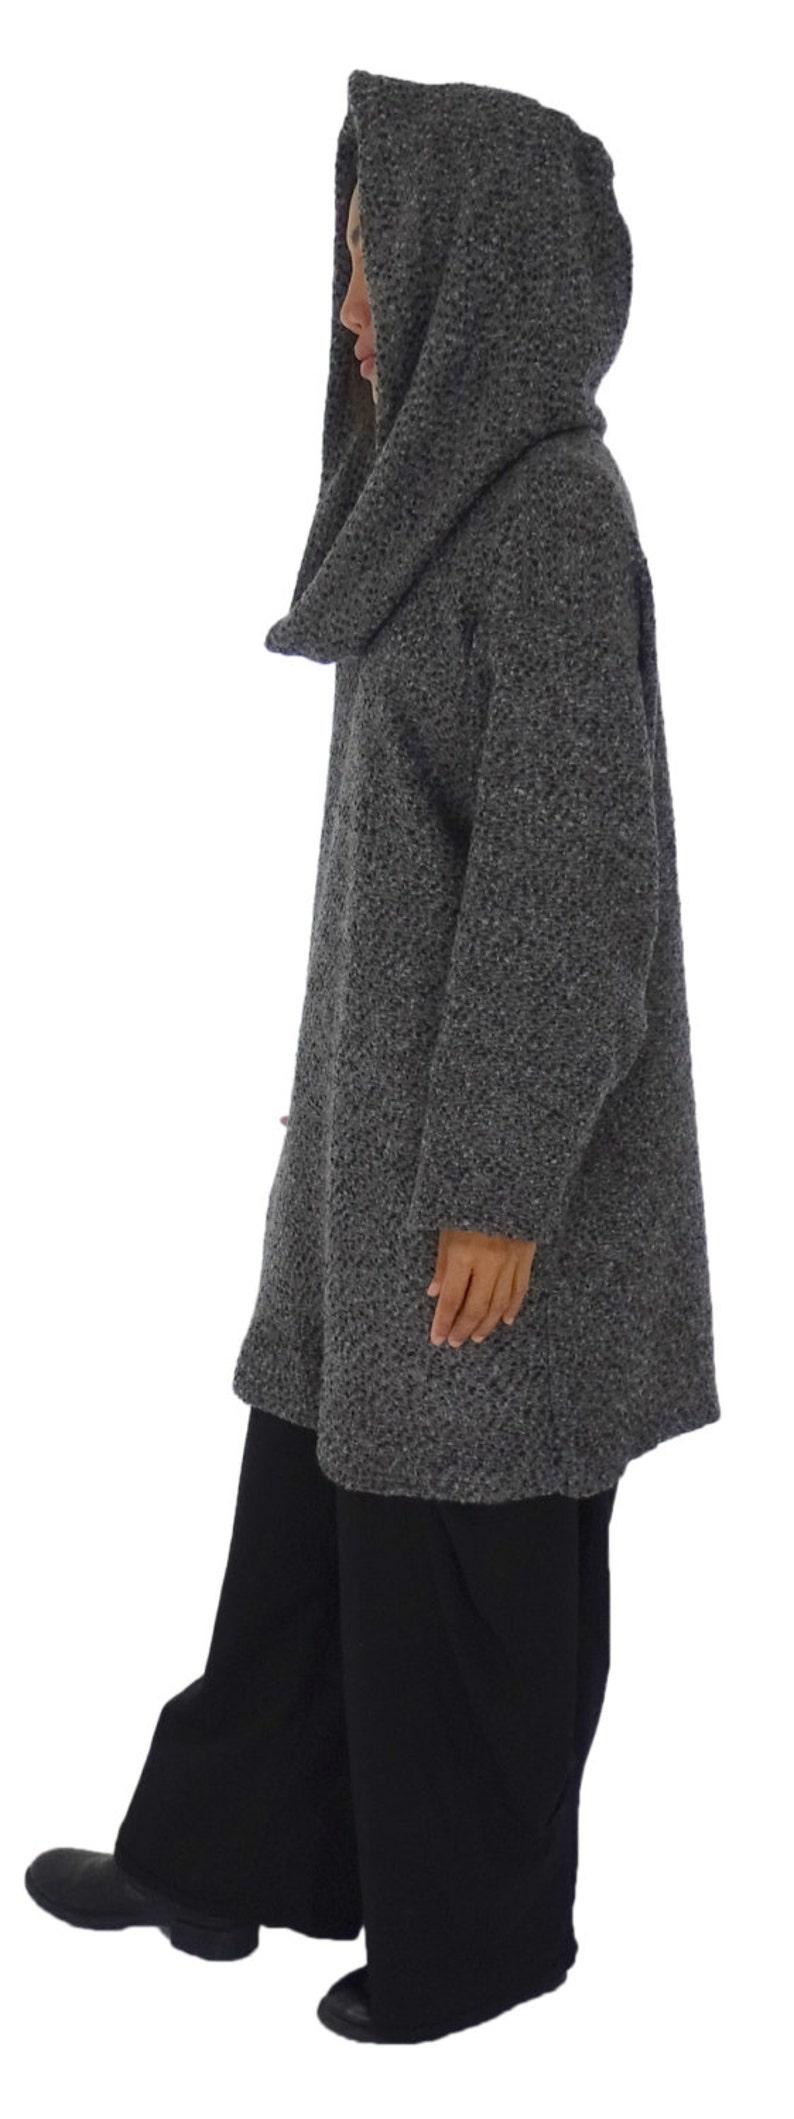 6d1ca2269c601 Wool oversize sweater HQ200GR tunic 70 polyesterbental 30%